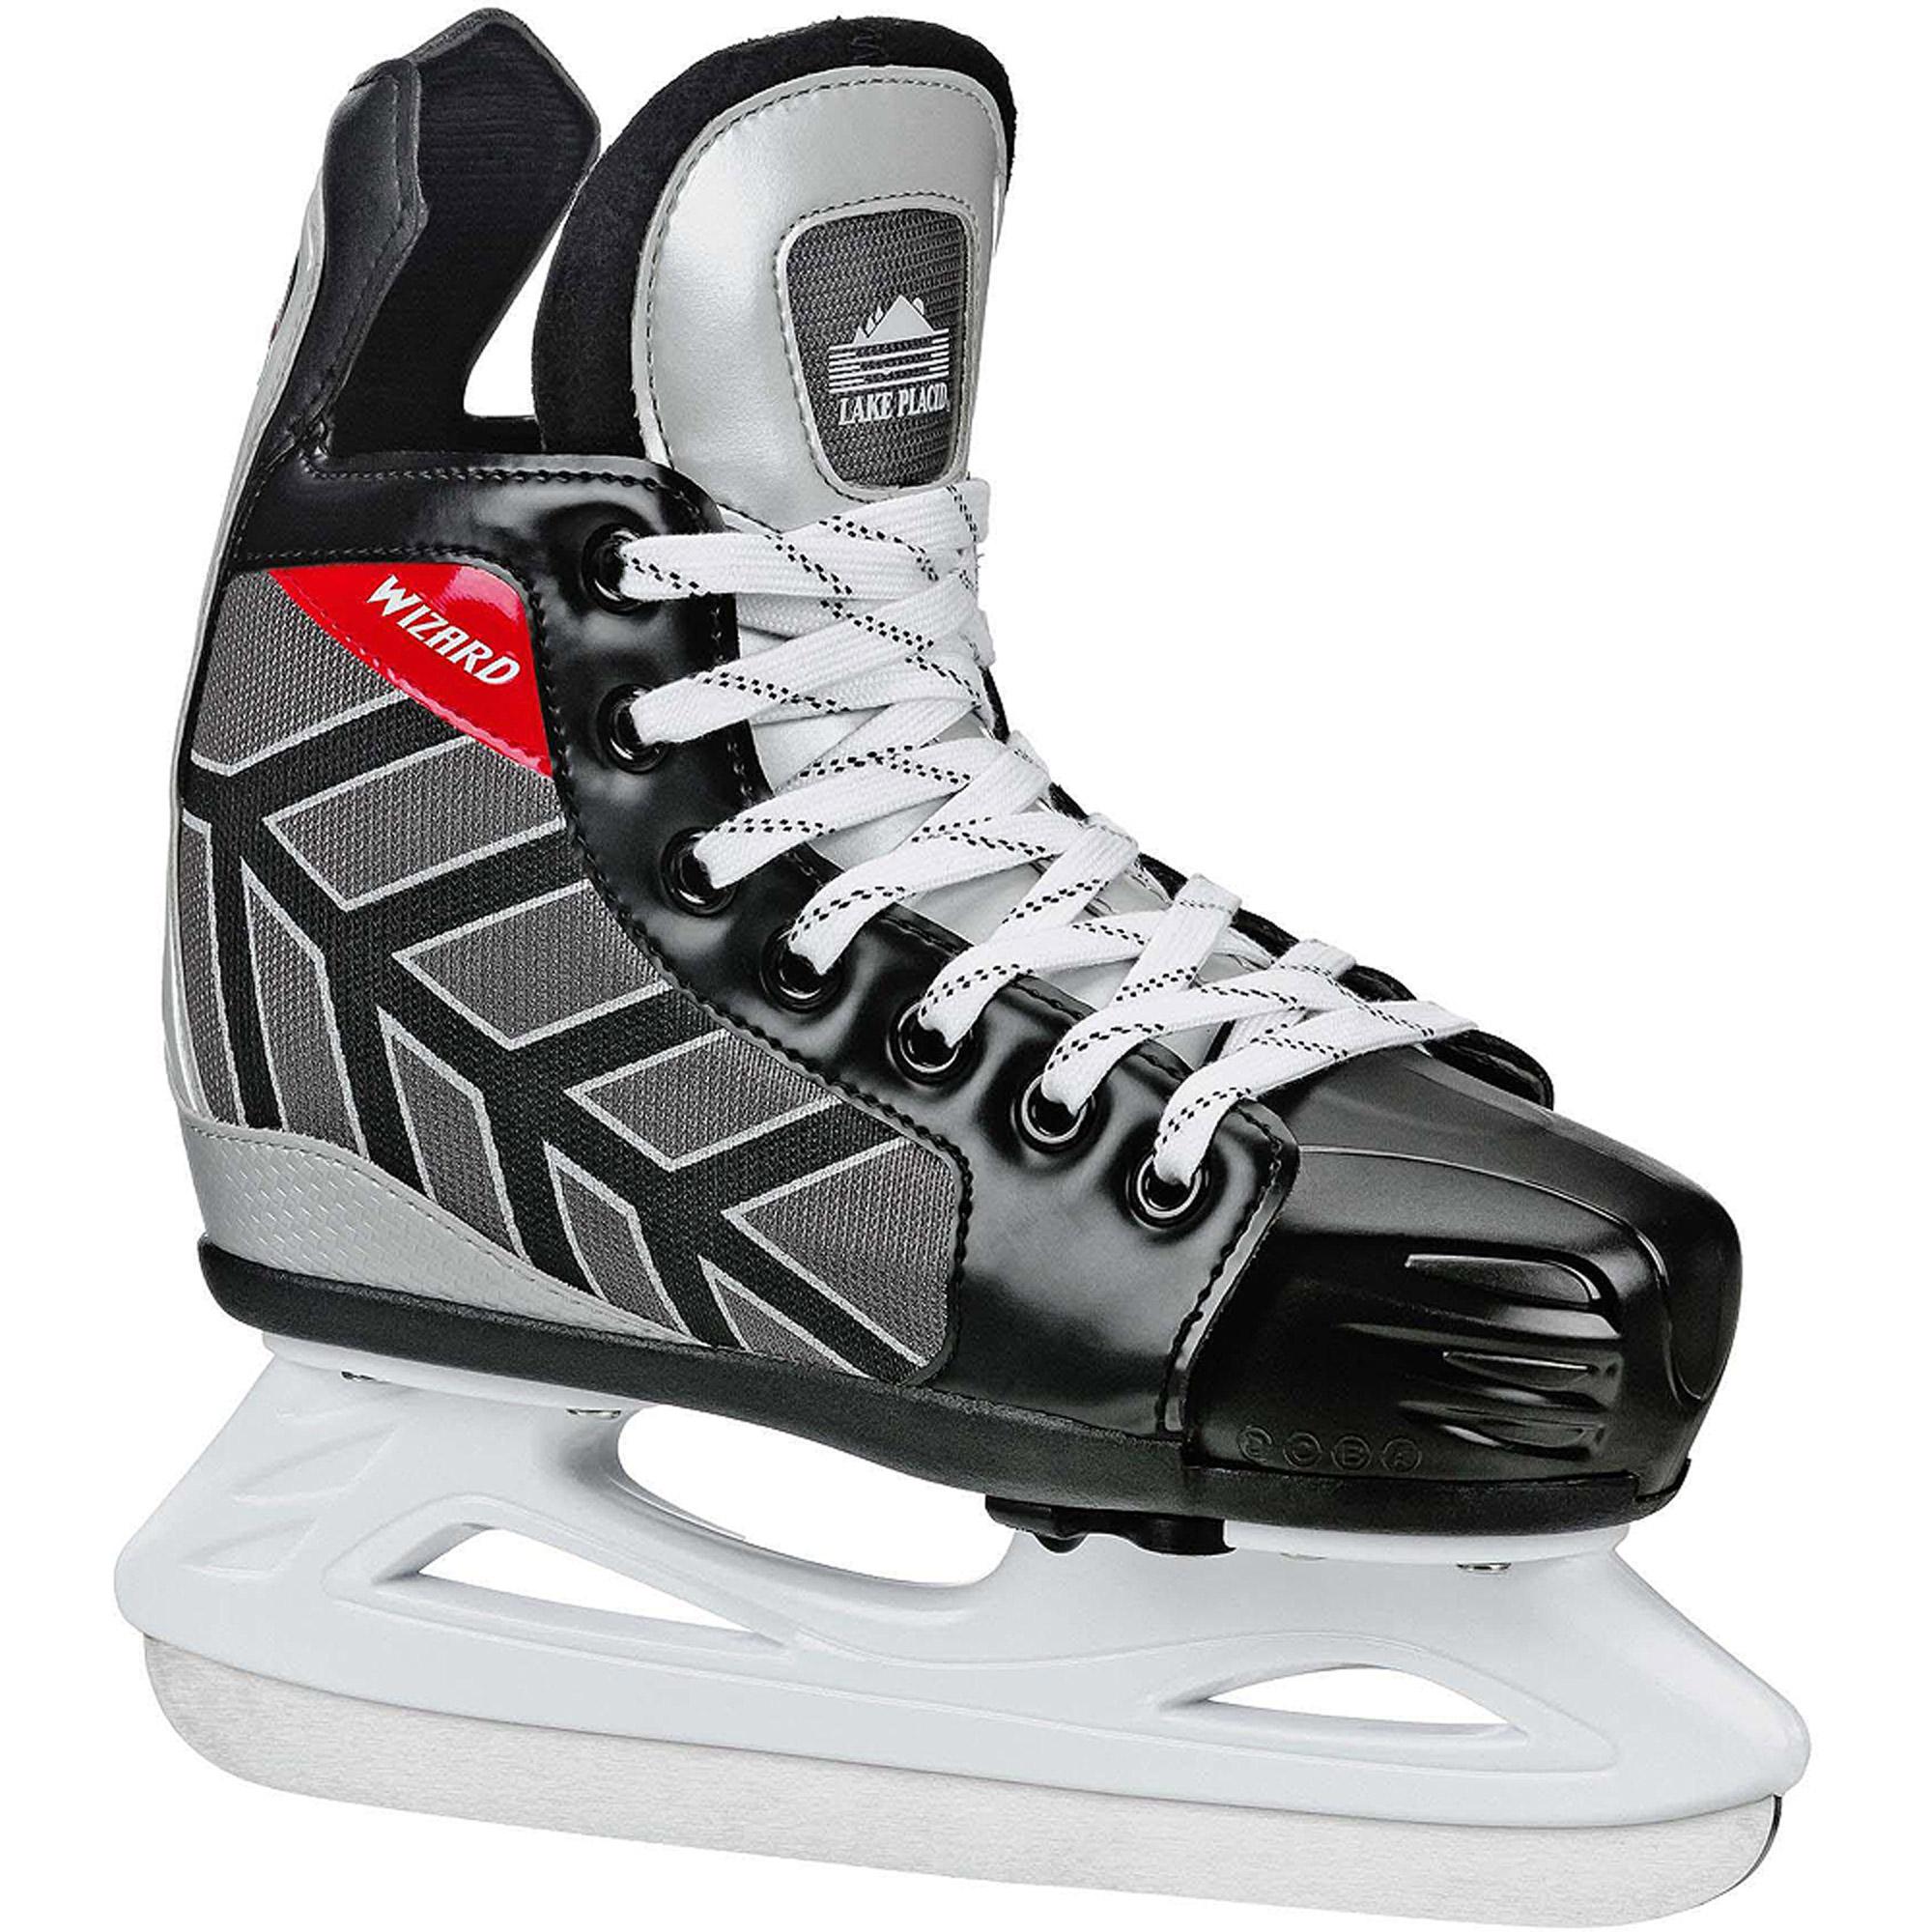 Lake Placid Wizard 400 Adjustable Ice Skates - Size S